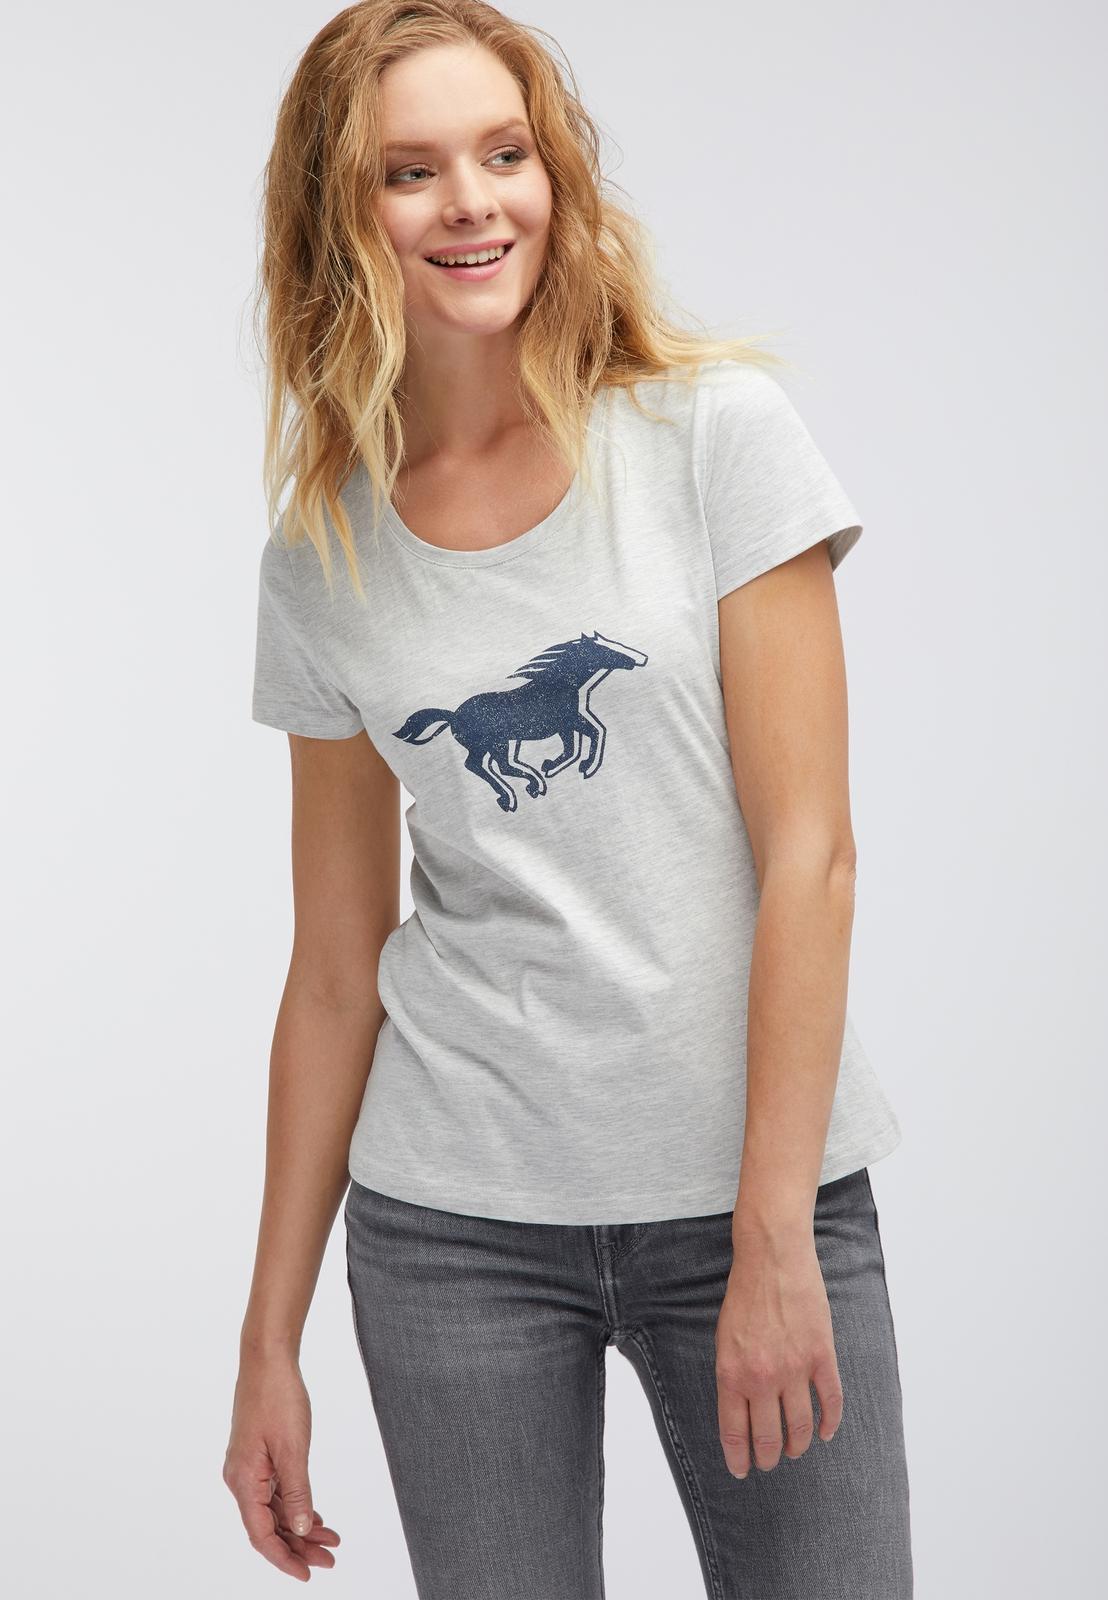 Футболка MUSTANG Logo Tee Special футболка женская mustang logo tee special цвет серый 1006035 4141 размер xs 40 42